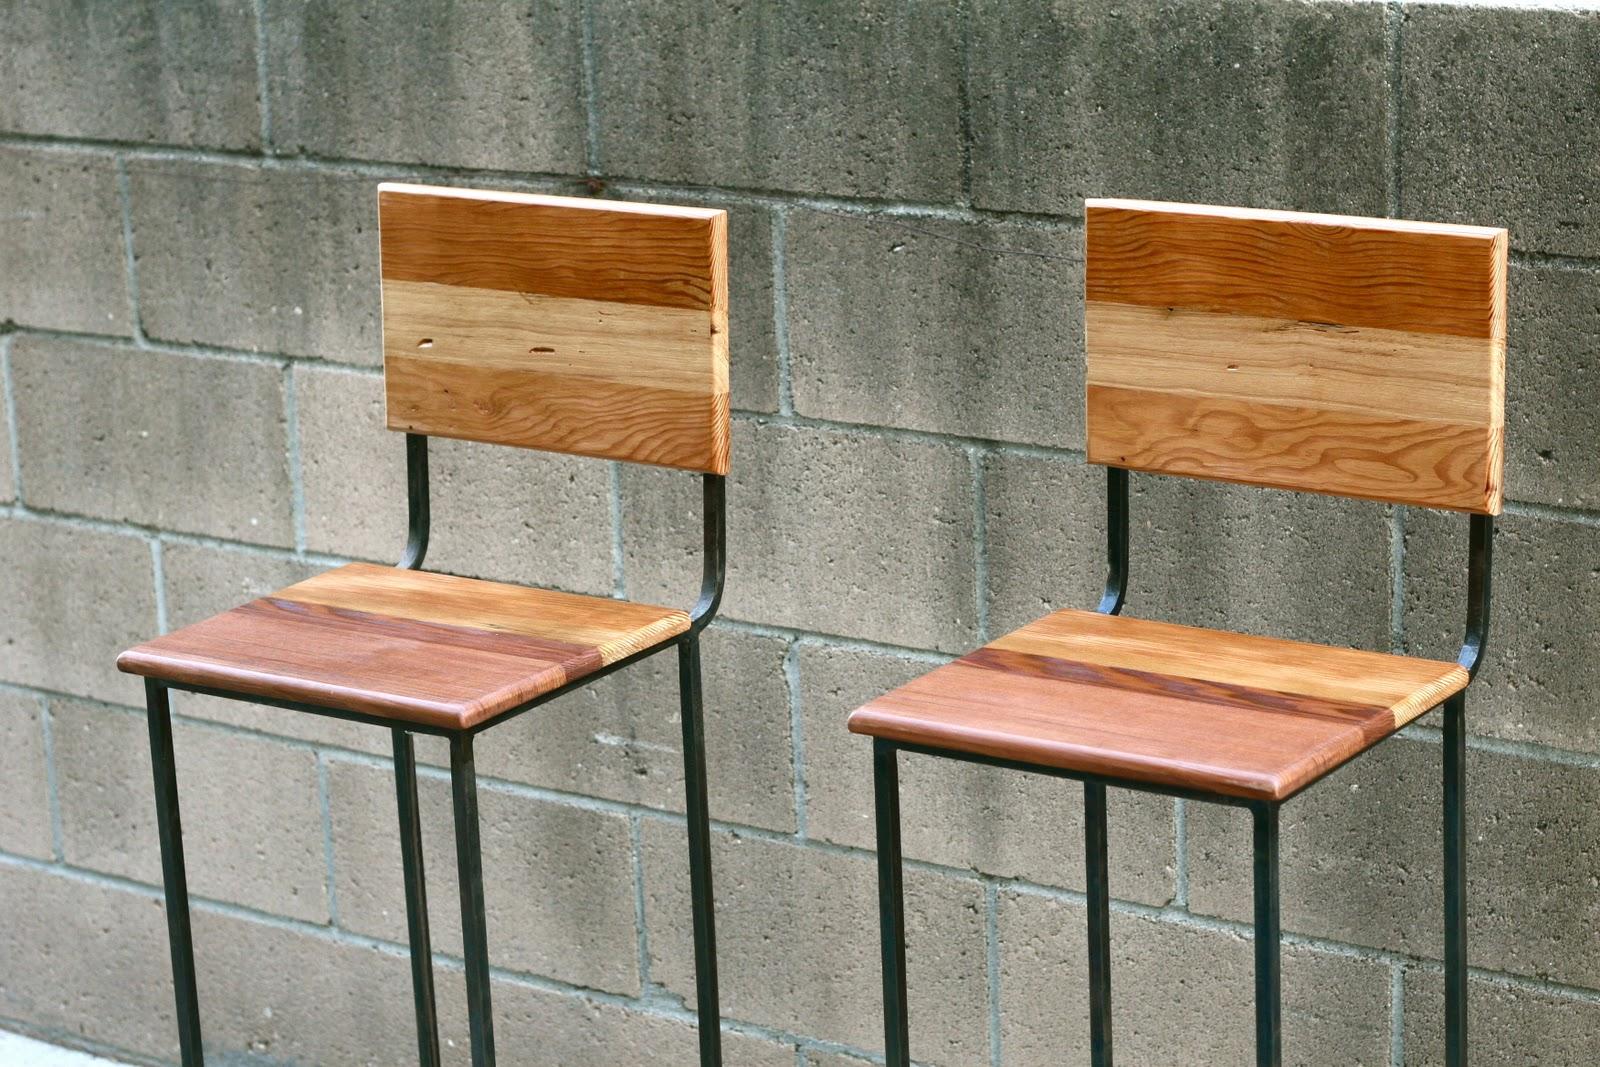 excellent wood metal furniture designs | Arbor Exchange | Reclaimed Wood Furniture: Metal Stools ...